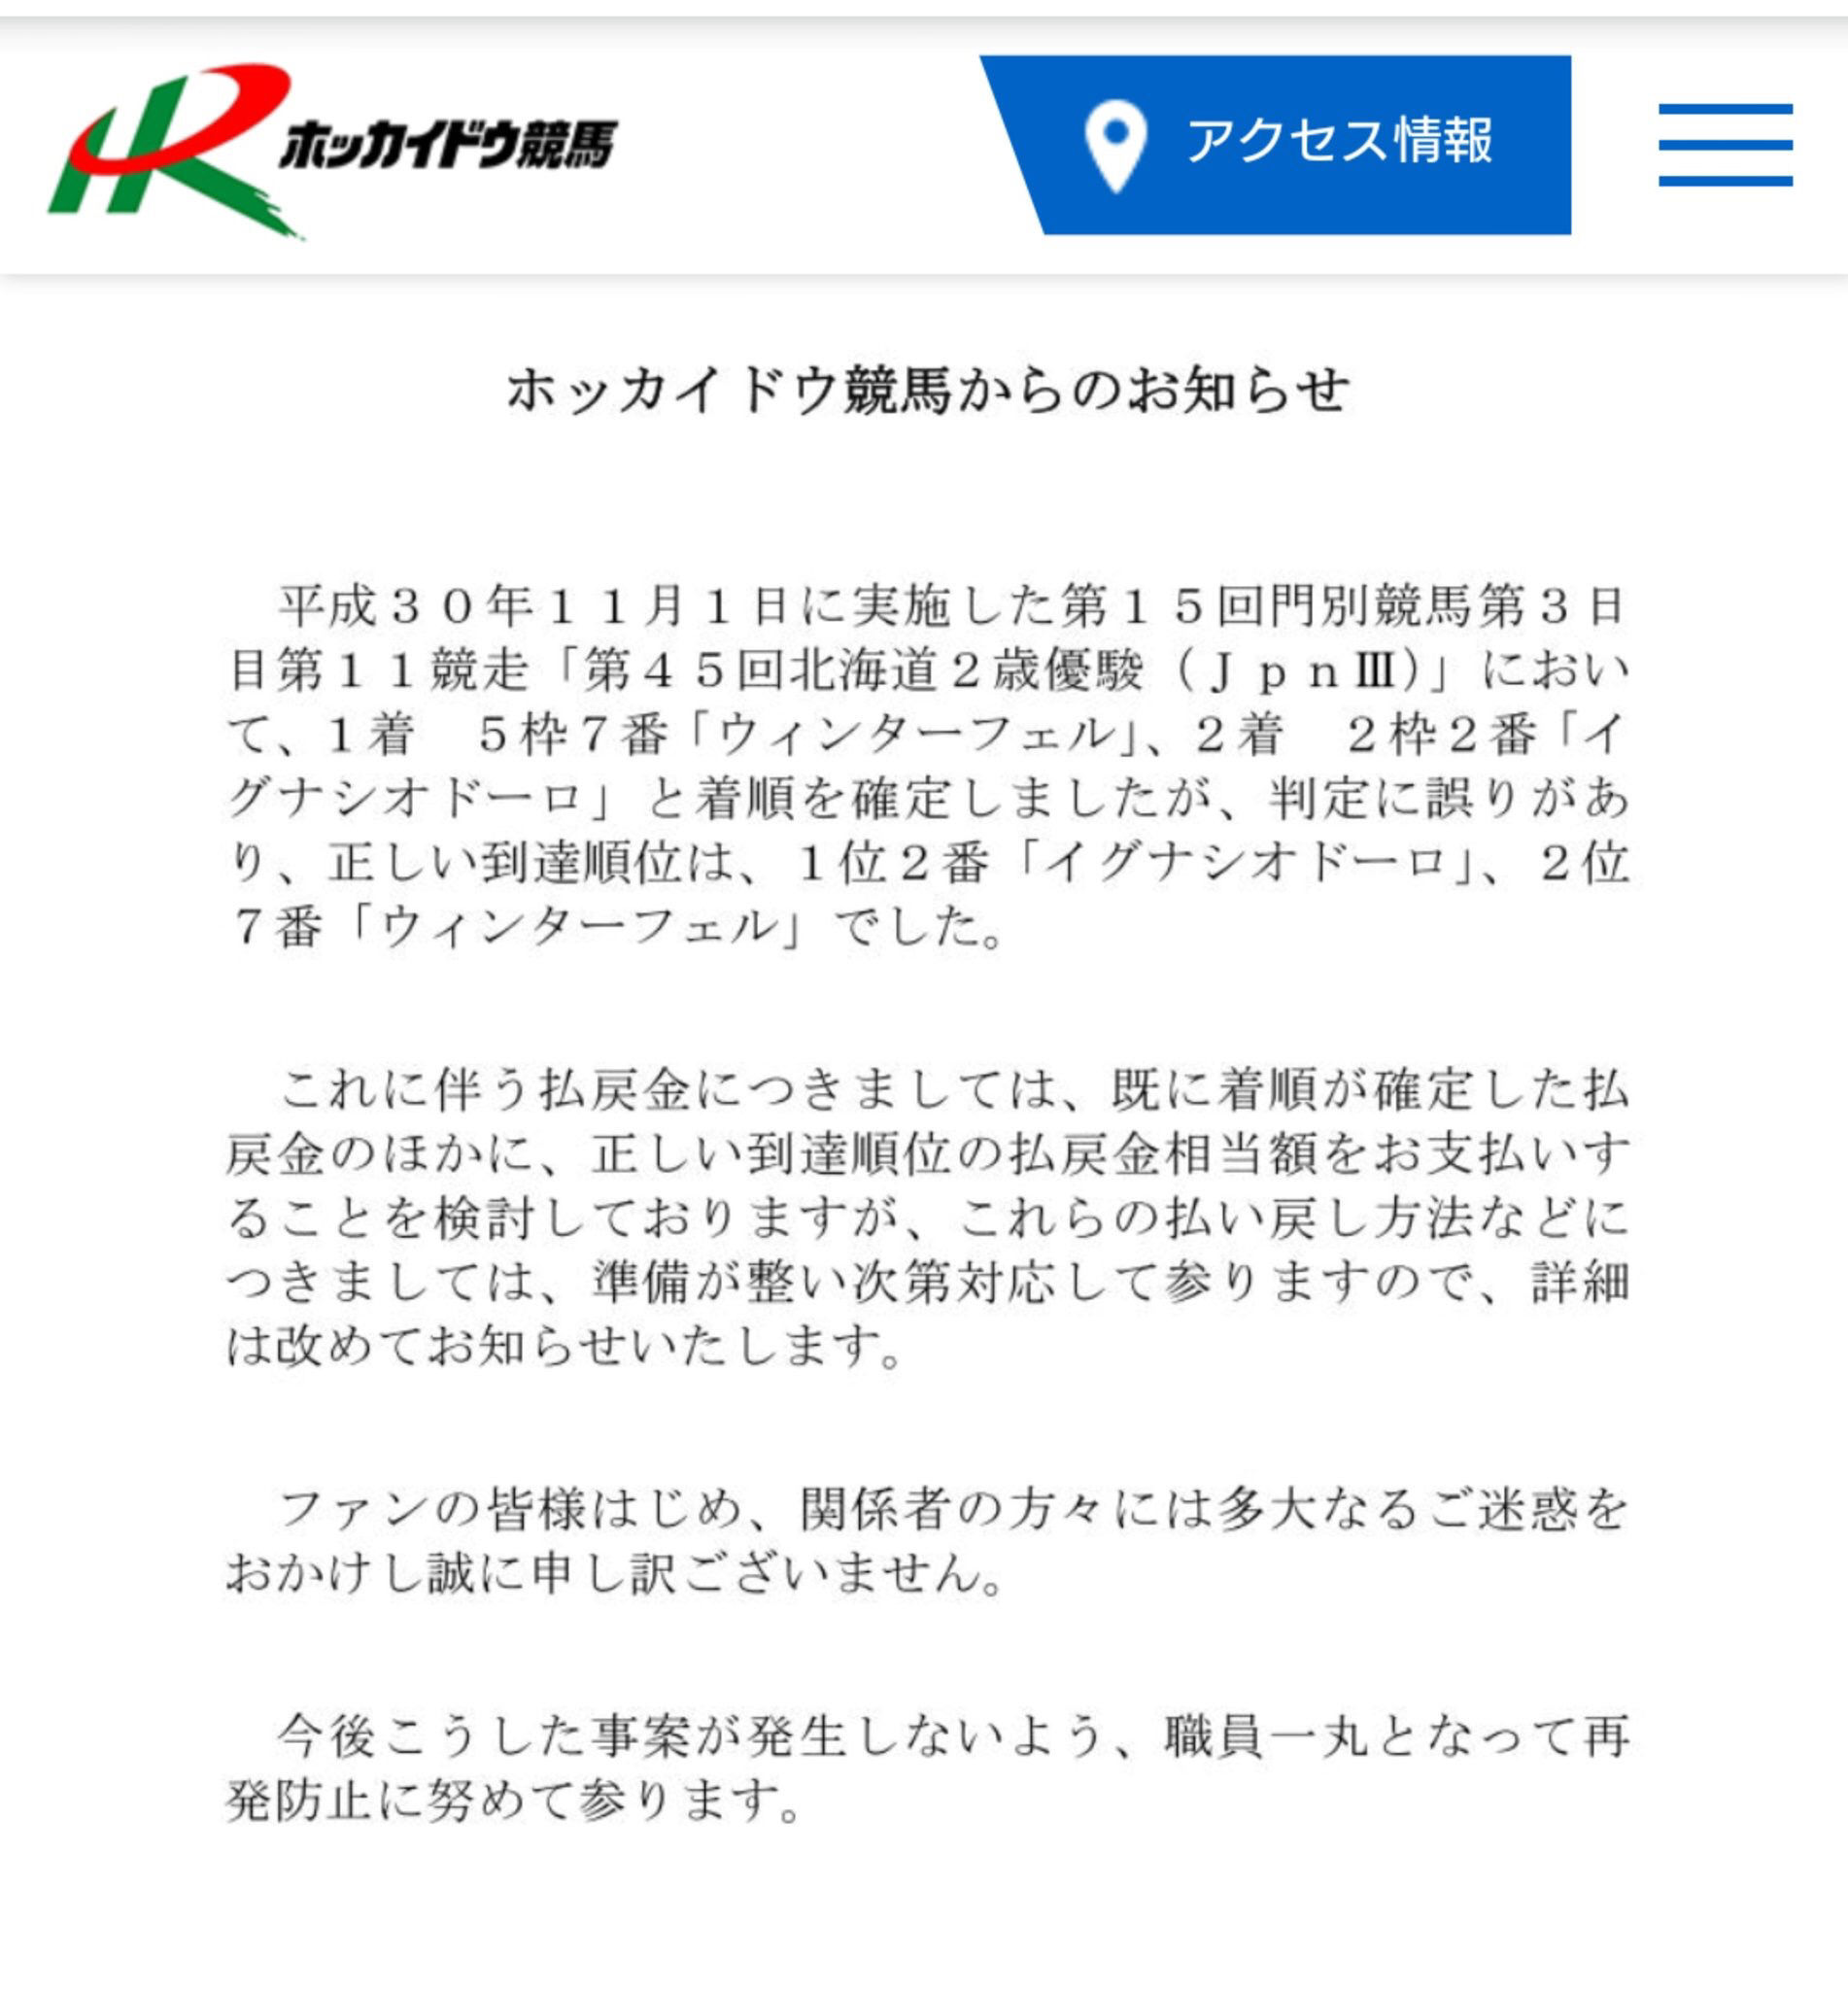 mnewsplus 1541151246 501 - ホッカイドウ競馬で誤審!北海道2歳優駿で1、2位の着順を逆に!